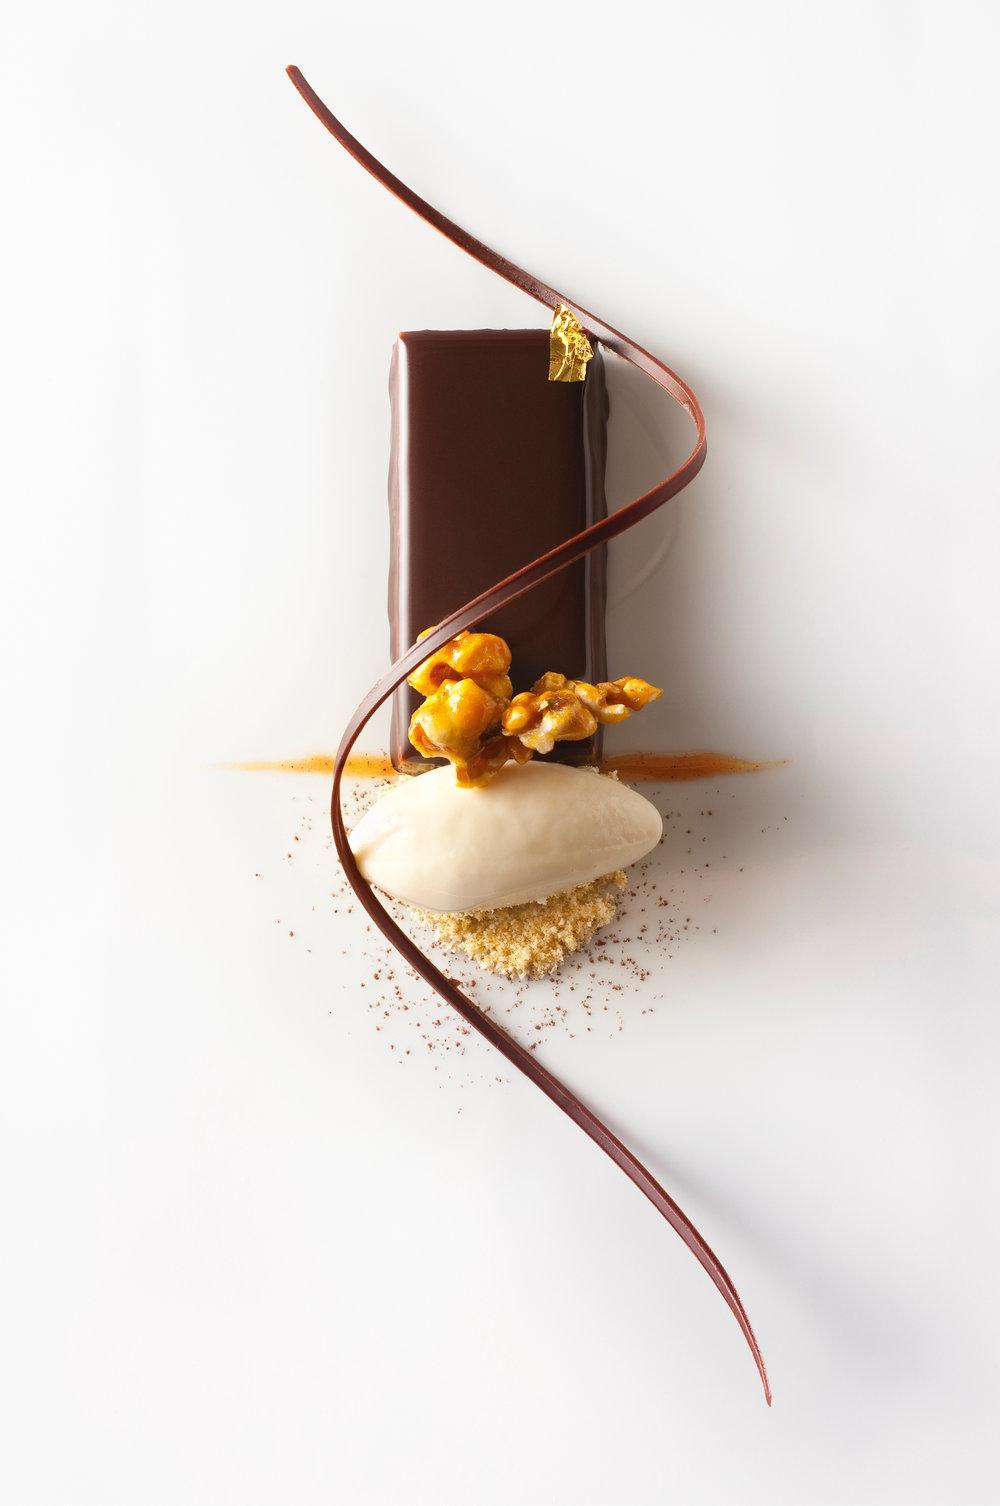 Chocolate Palette with Peanuts and Popcorn Ice Cream © Francesco Tonelli.